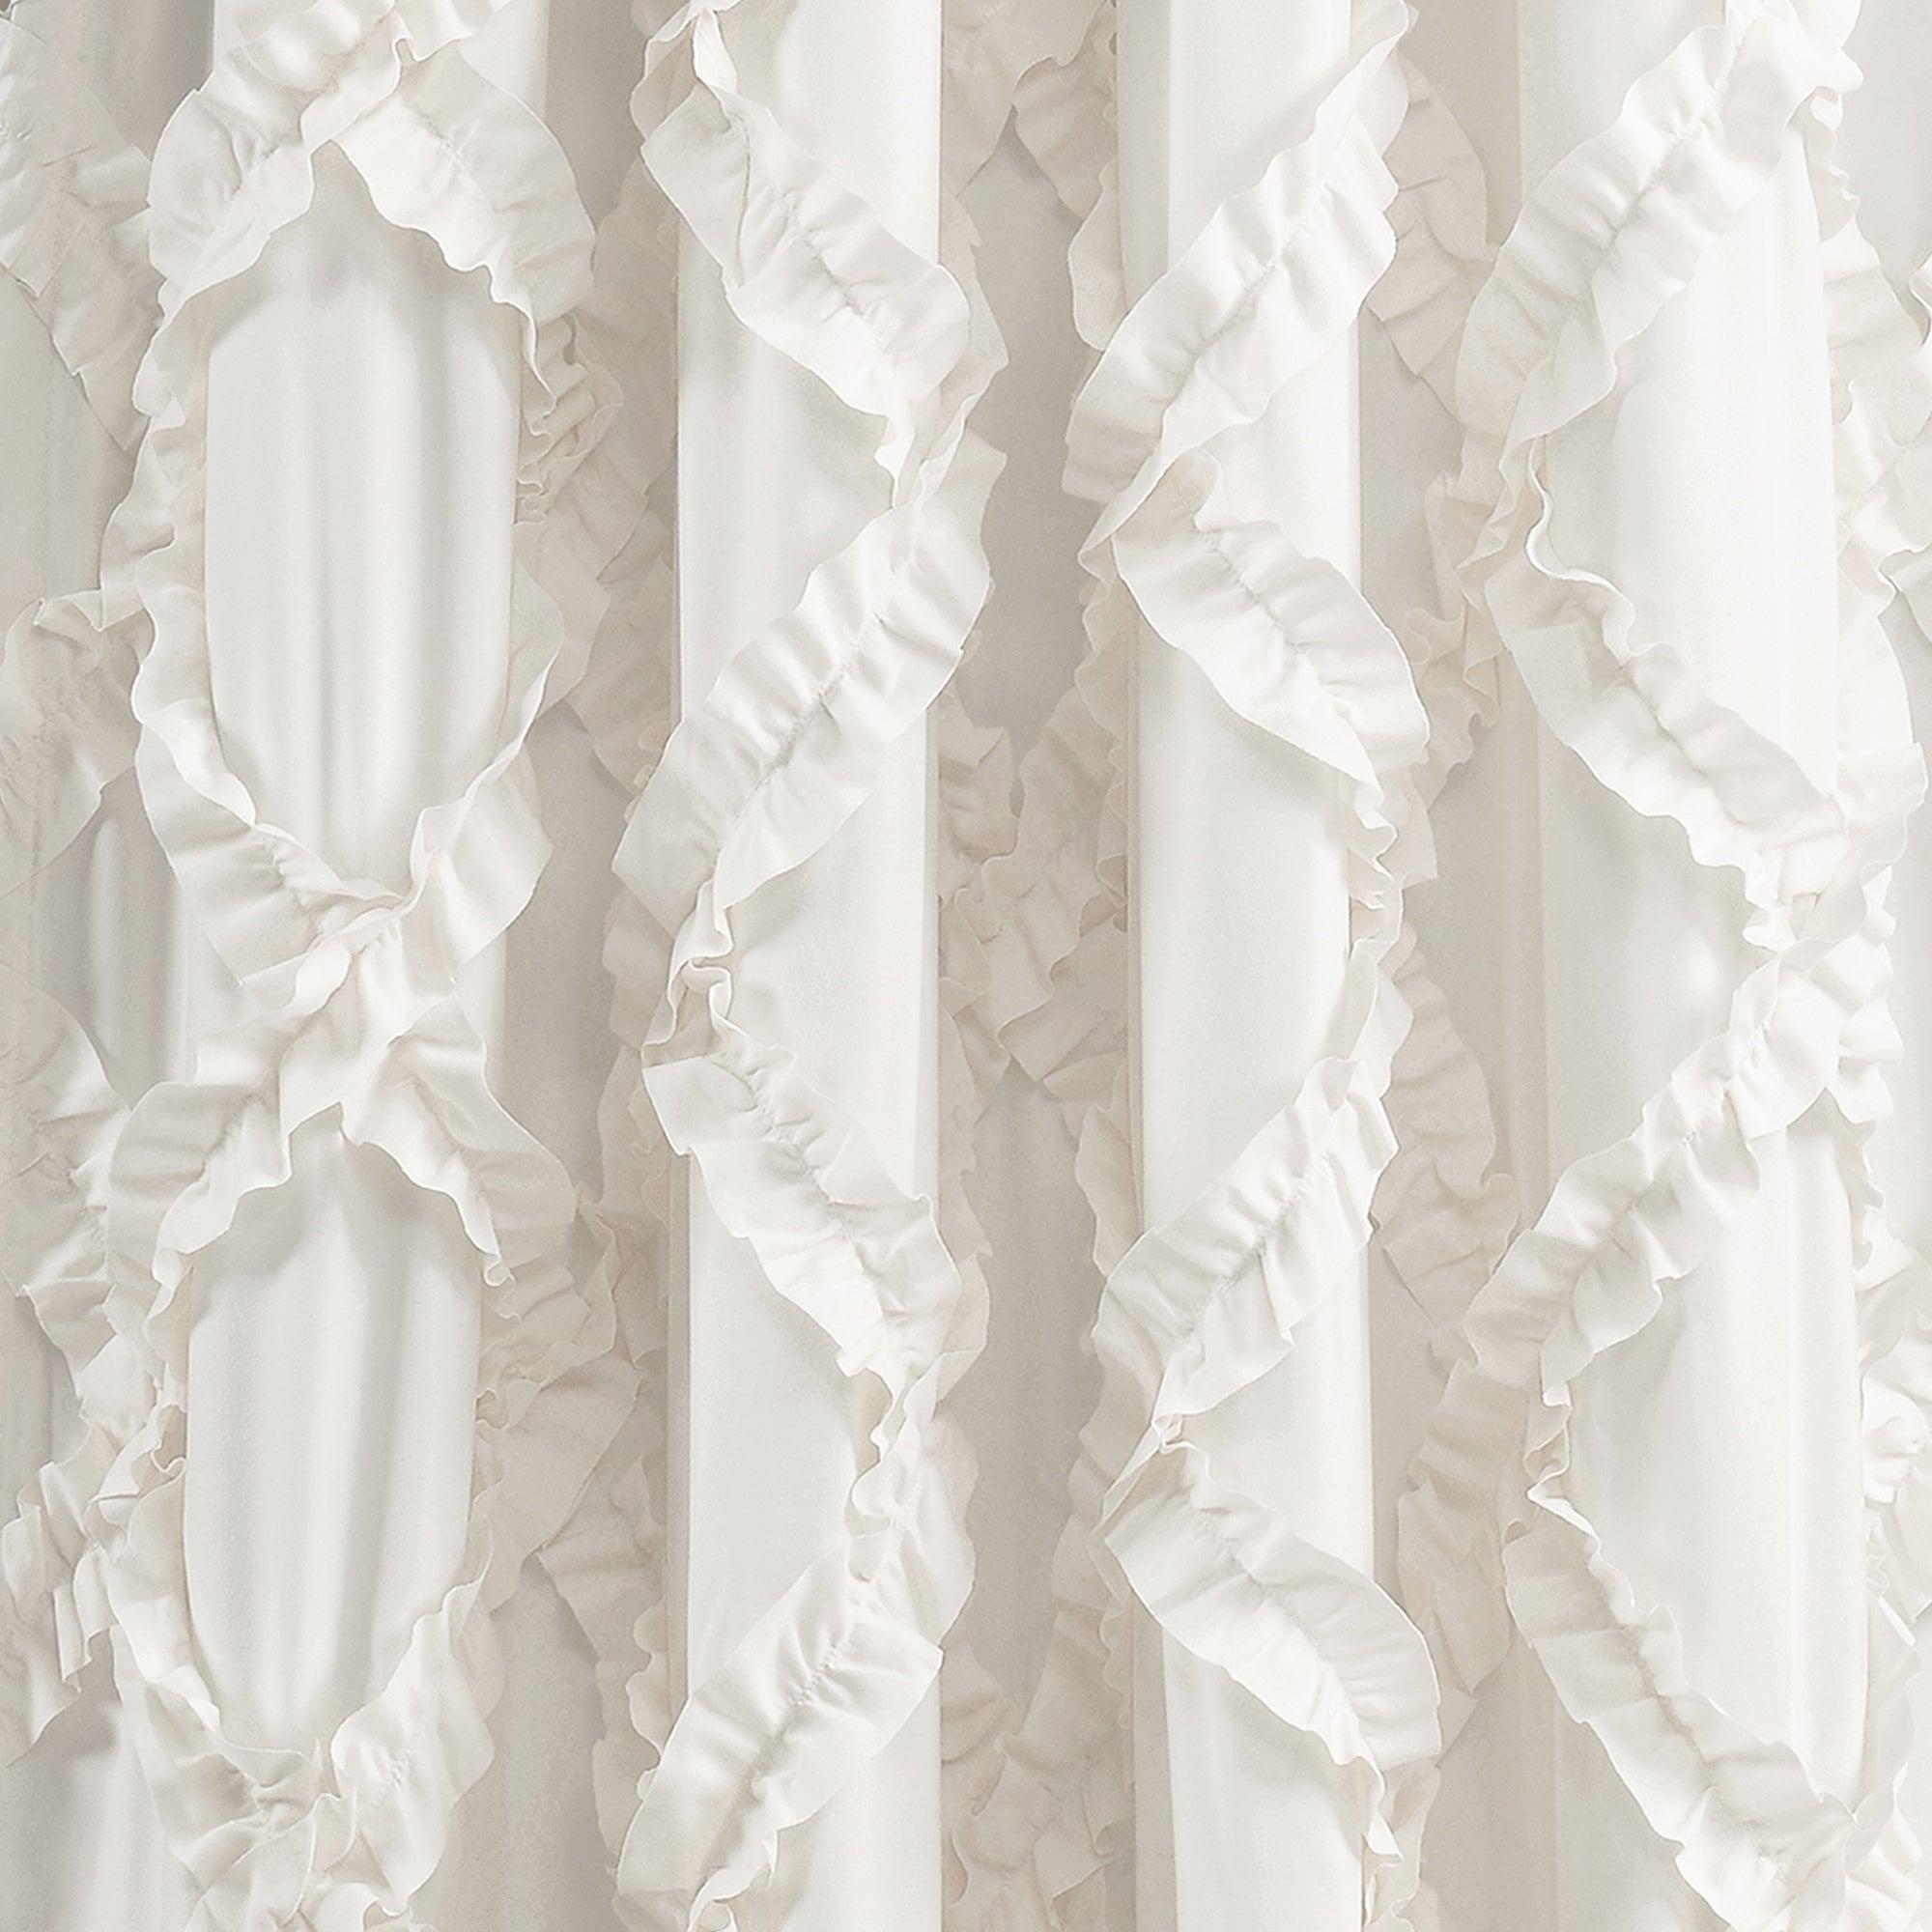 2020 Ruffle Diamond Curtain Panel Pairs With Lush Decor Ruffle Diamond Curtain Panel Pair (View 7 of 20)